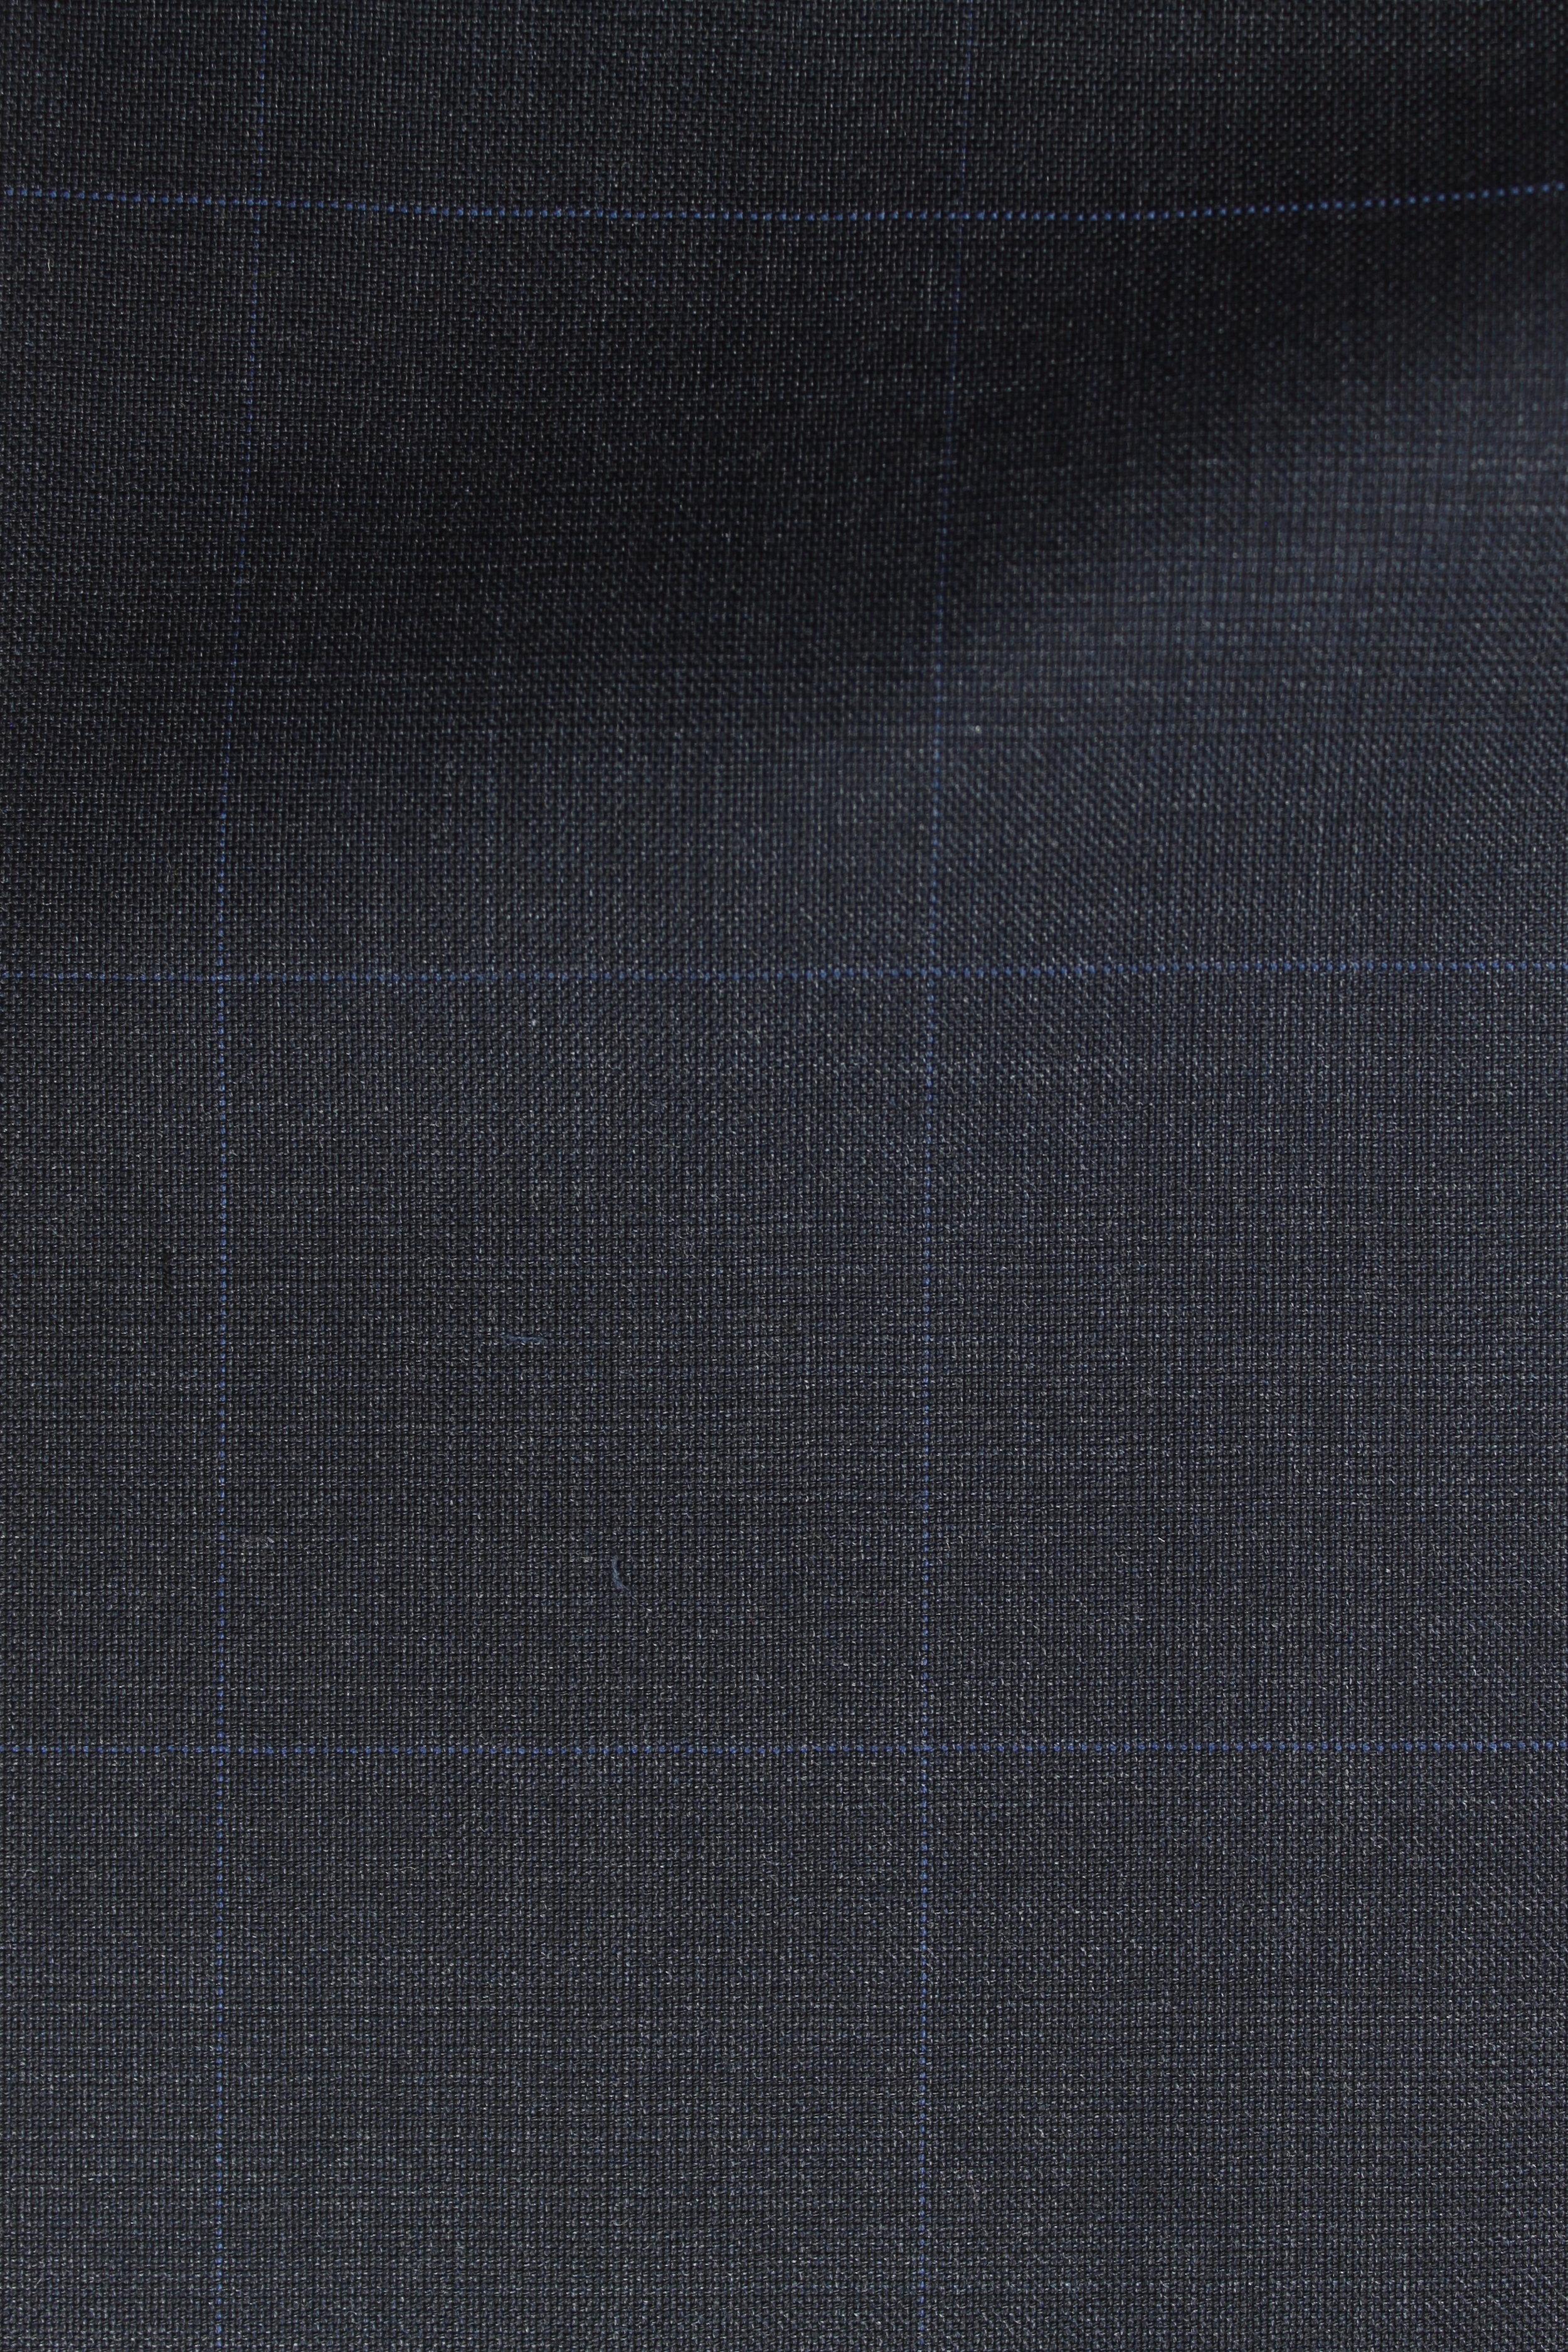 7563 Blue Navy Windowpane 280g.JPG